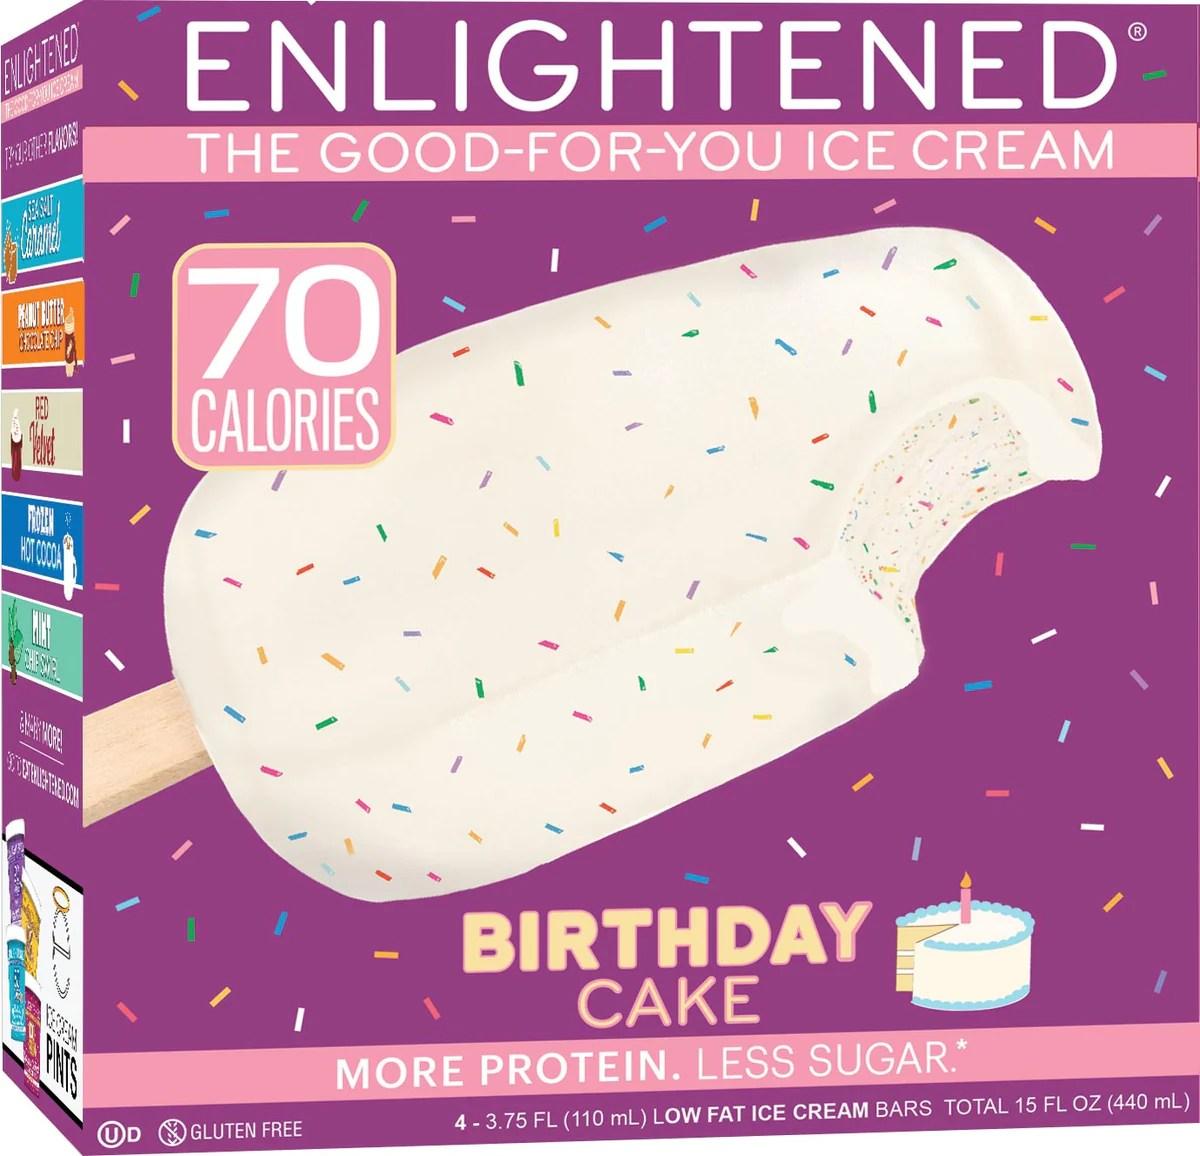 Birthday Cake Ice Cream Bars Enlightened Enlightened Ice Cream